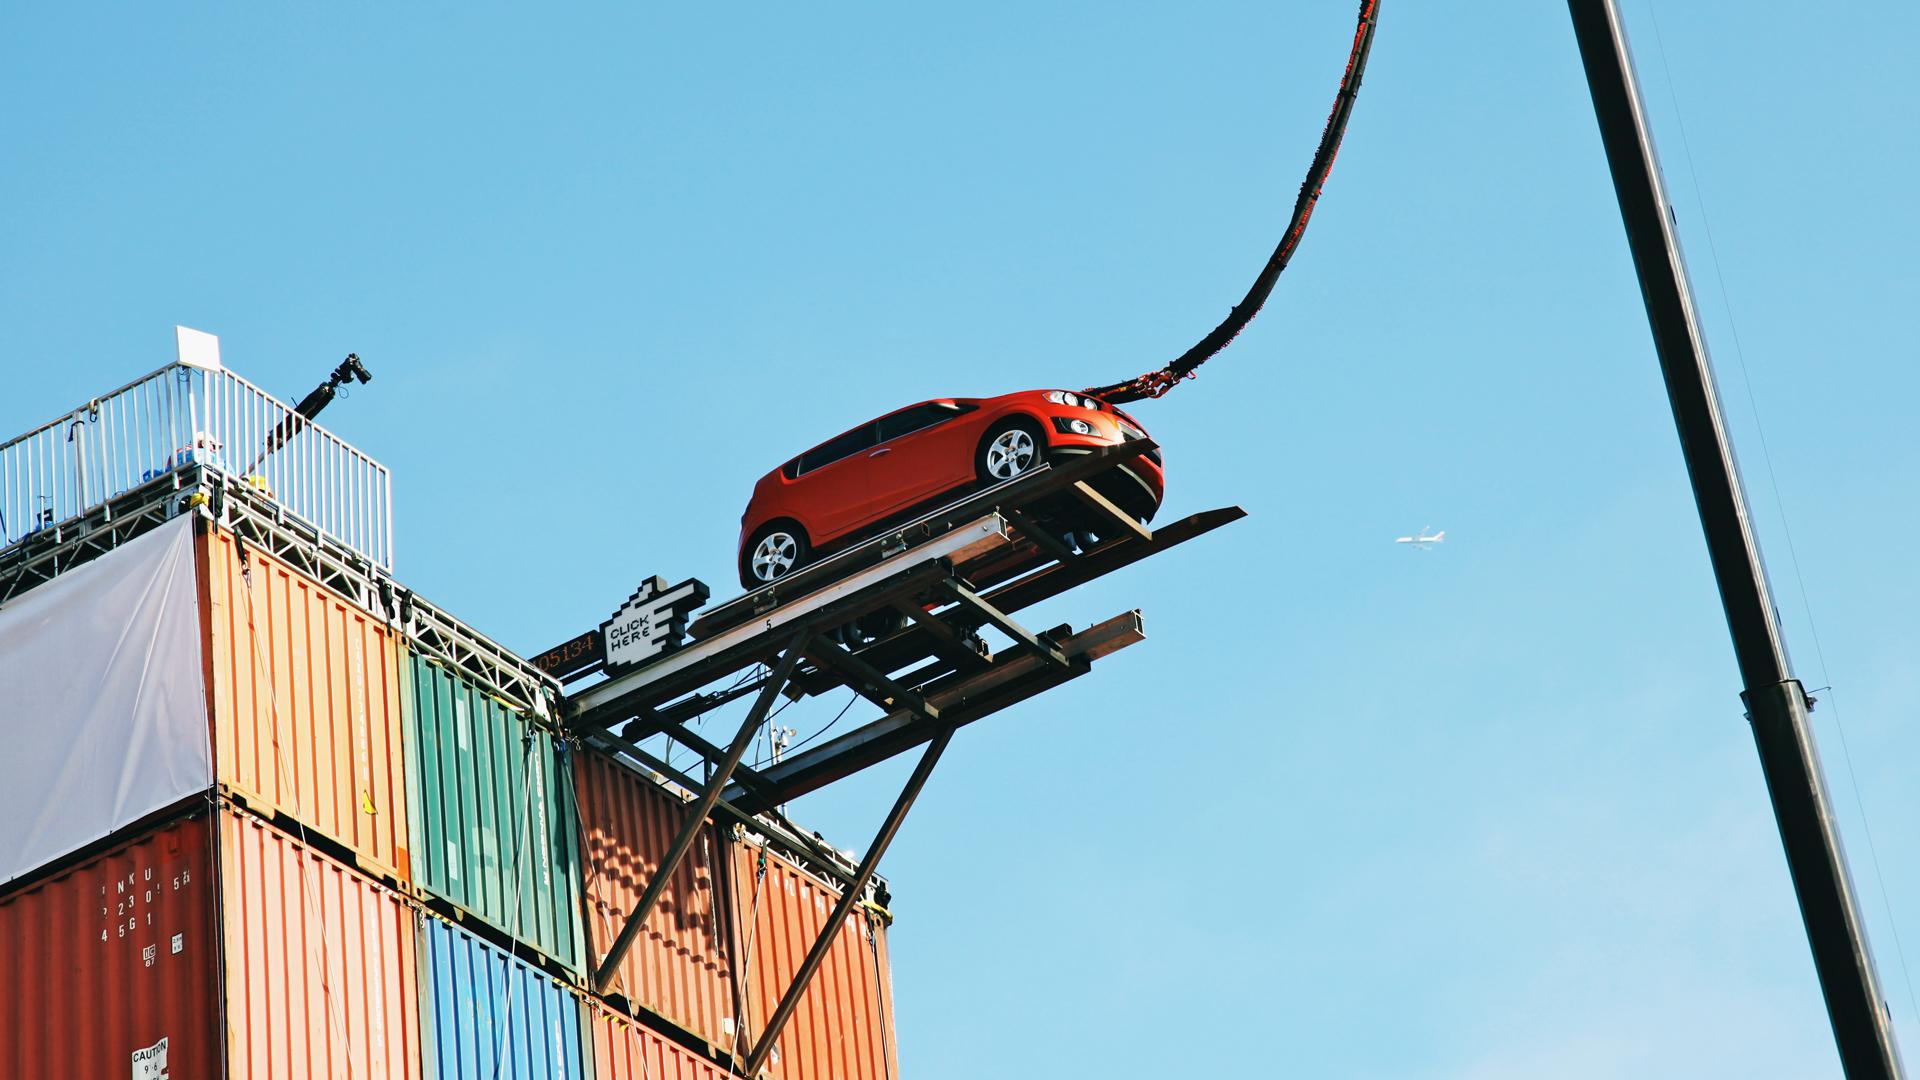 Chevy Sonic Launch - Bunjee Stunt.